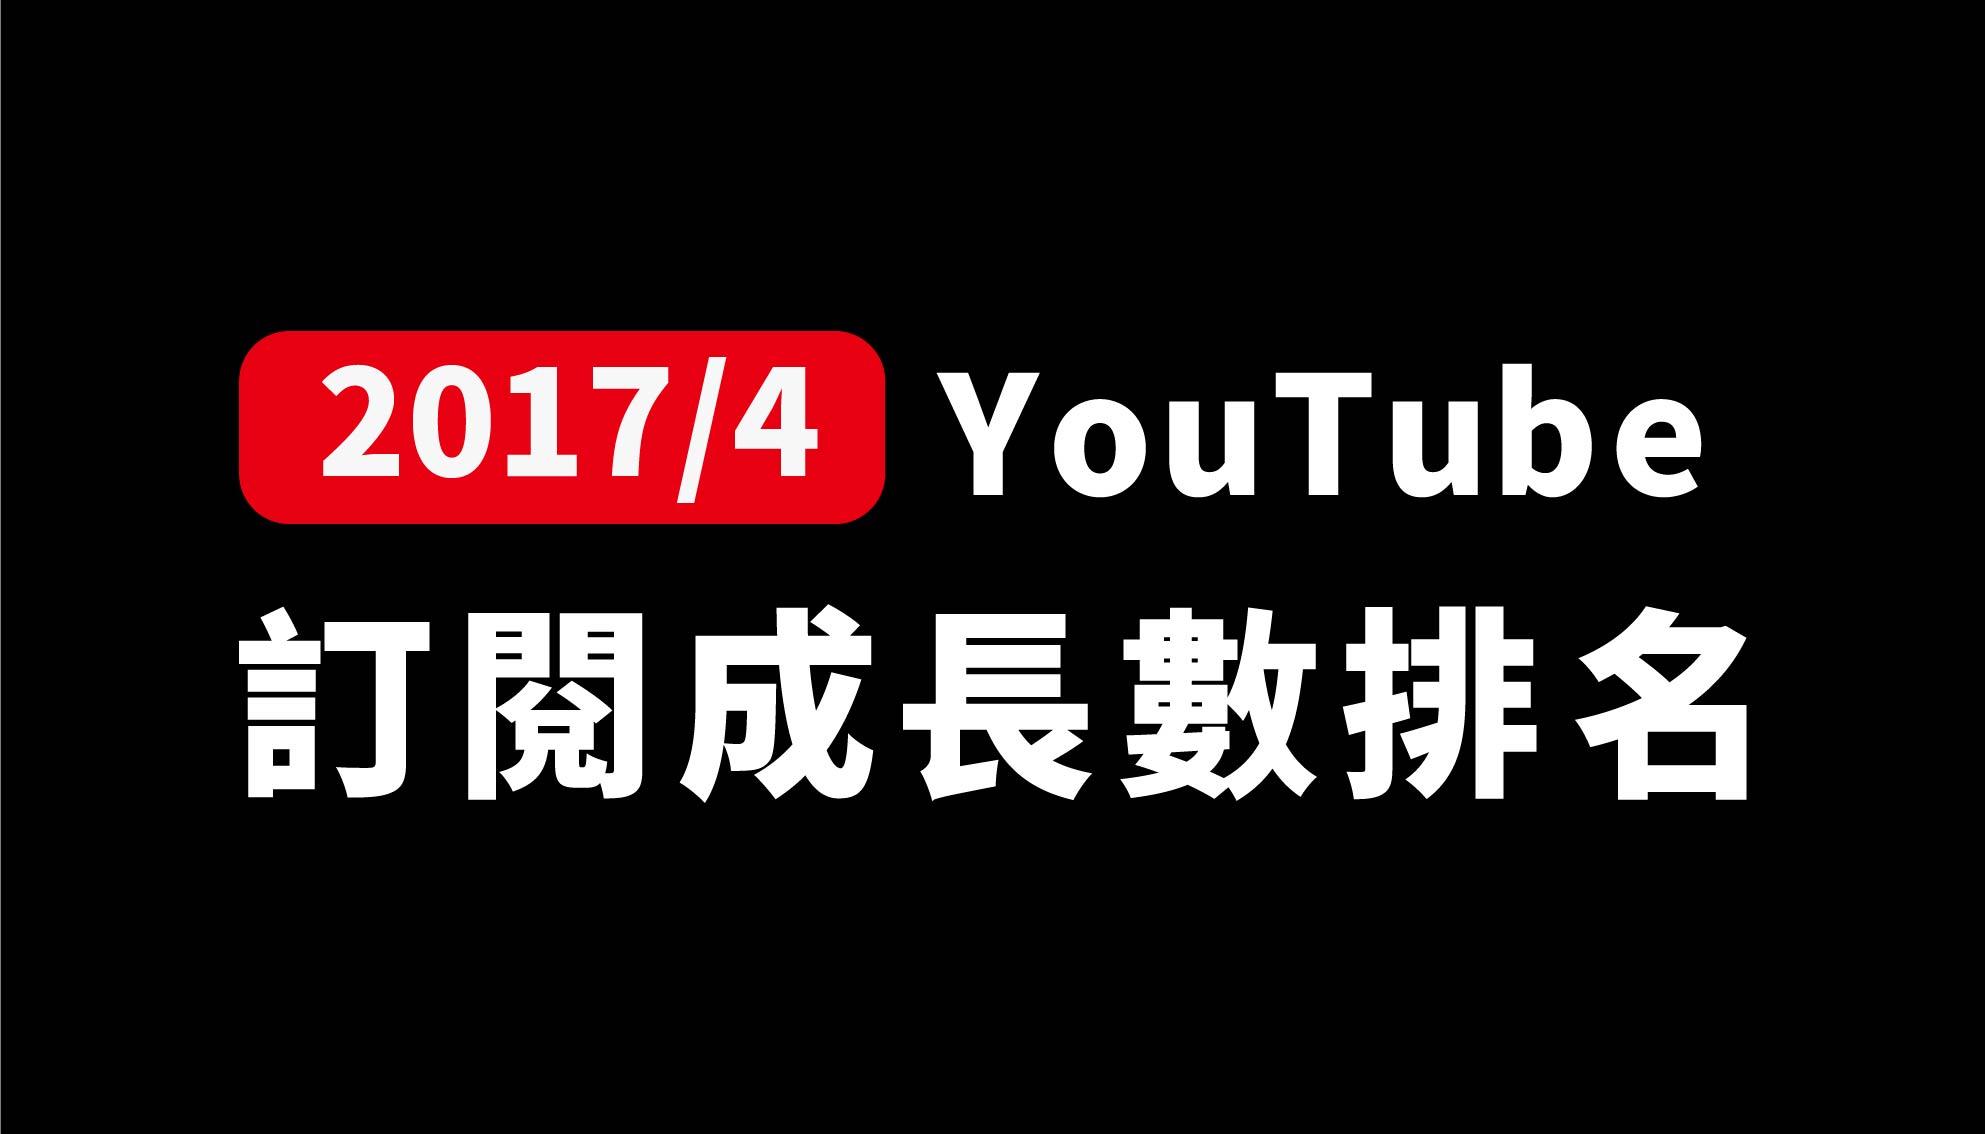 InteRed - YouTube頻道四月份訂閱數排名